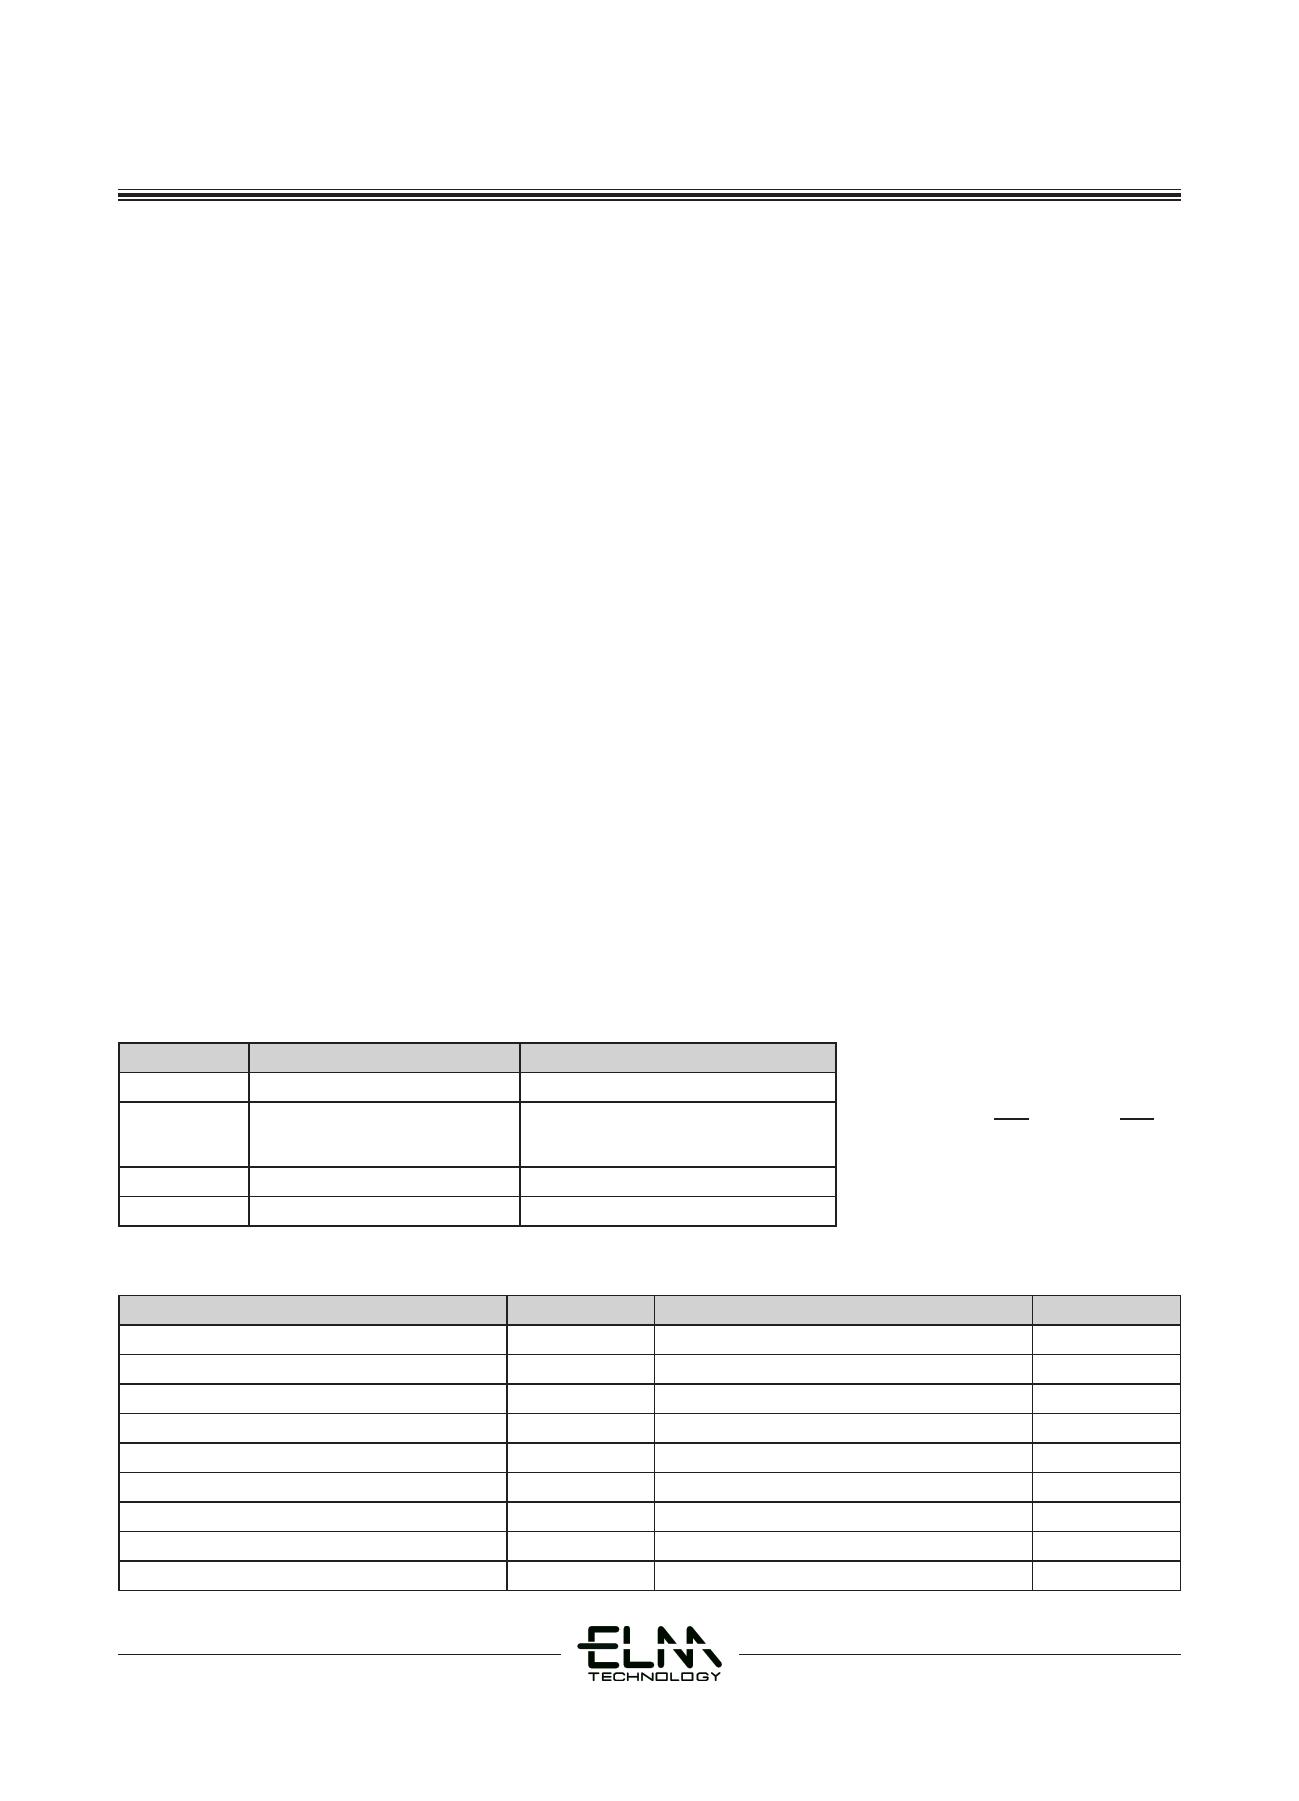 ELM7SH02TB Datasheet, ELM7SH02TB PDF,ピン配置, 機能